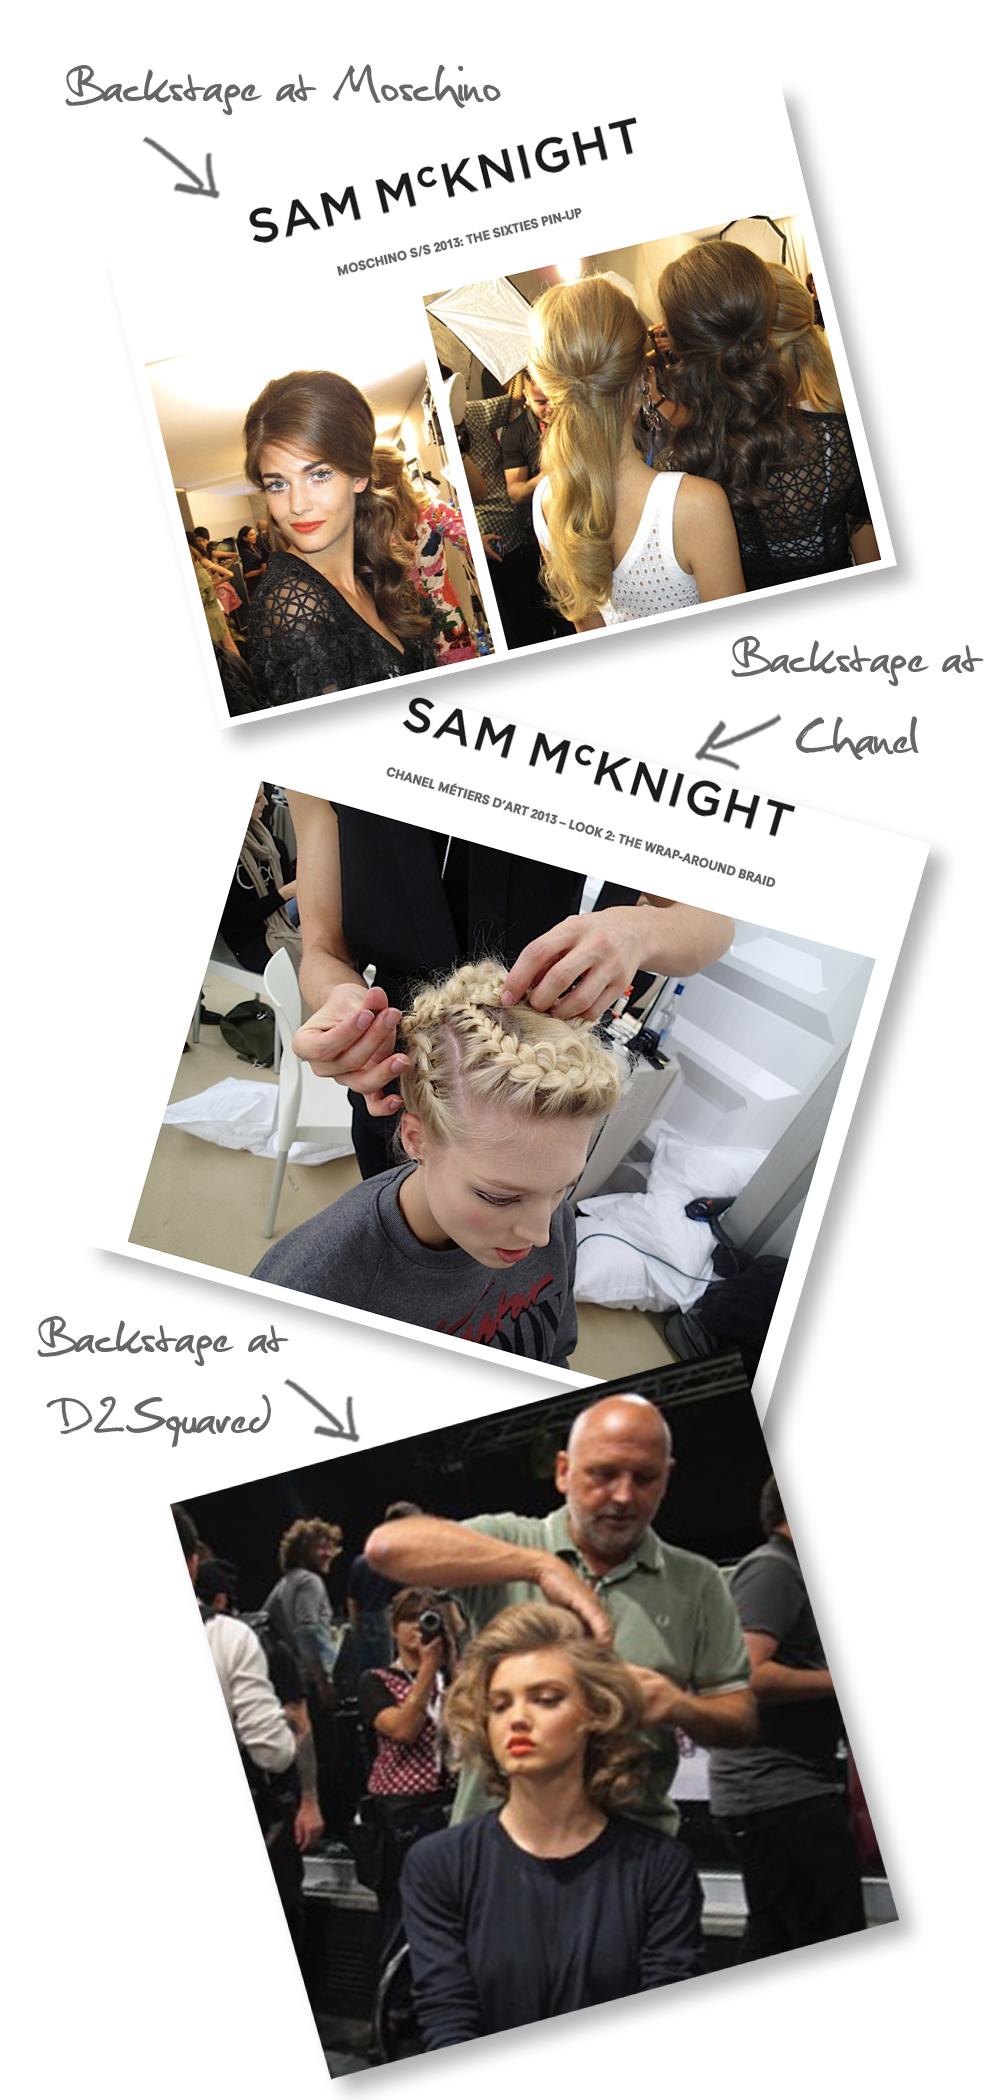 SamMcknight